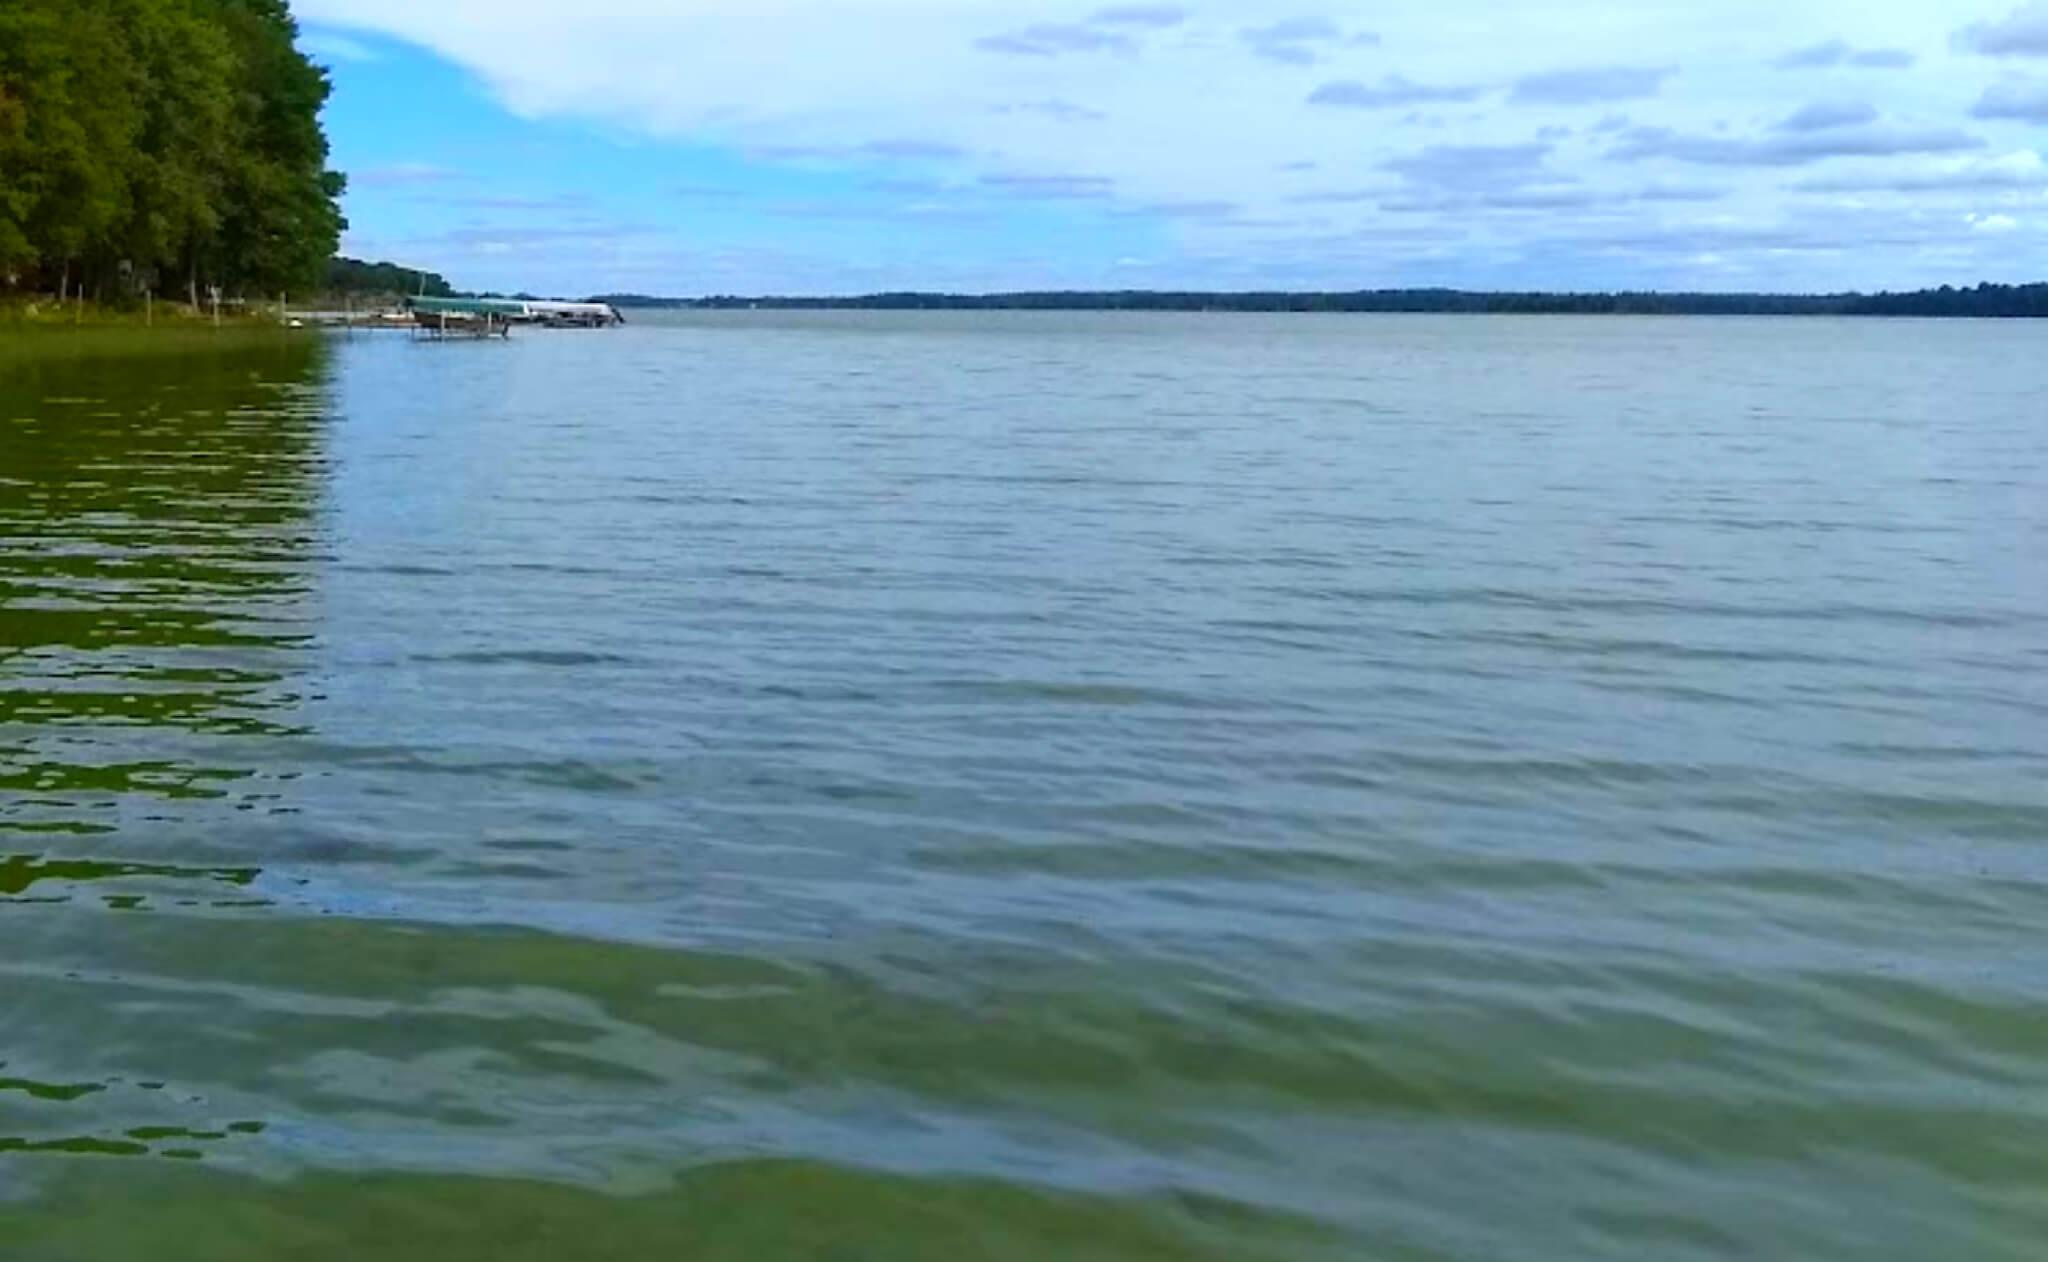 Black-Lake-Fishing-Report-Guide-New-York-NY-02